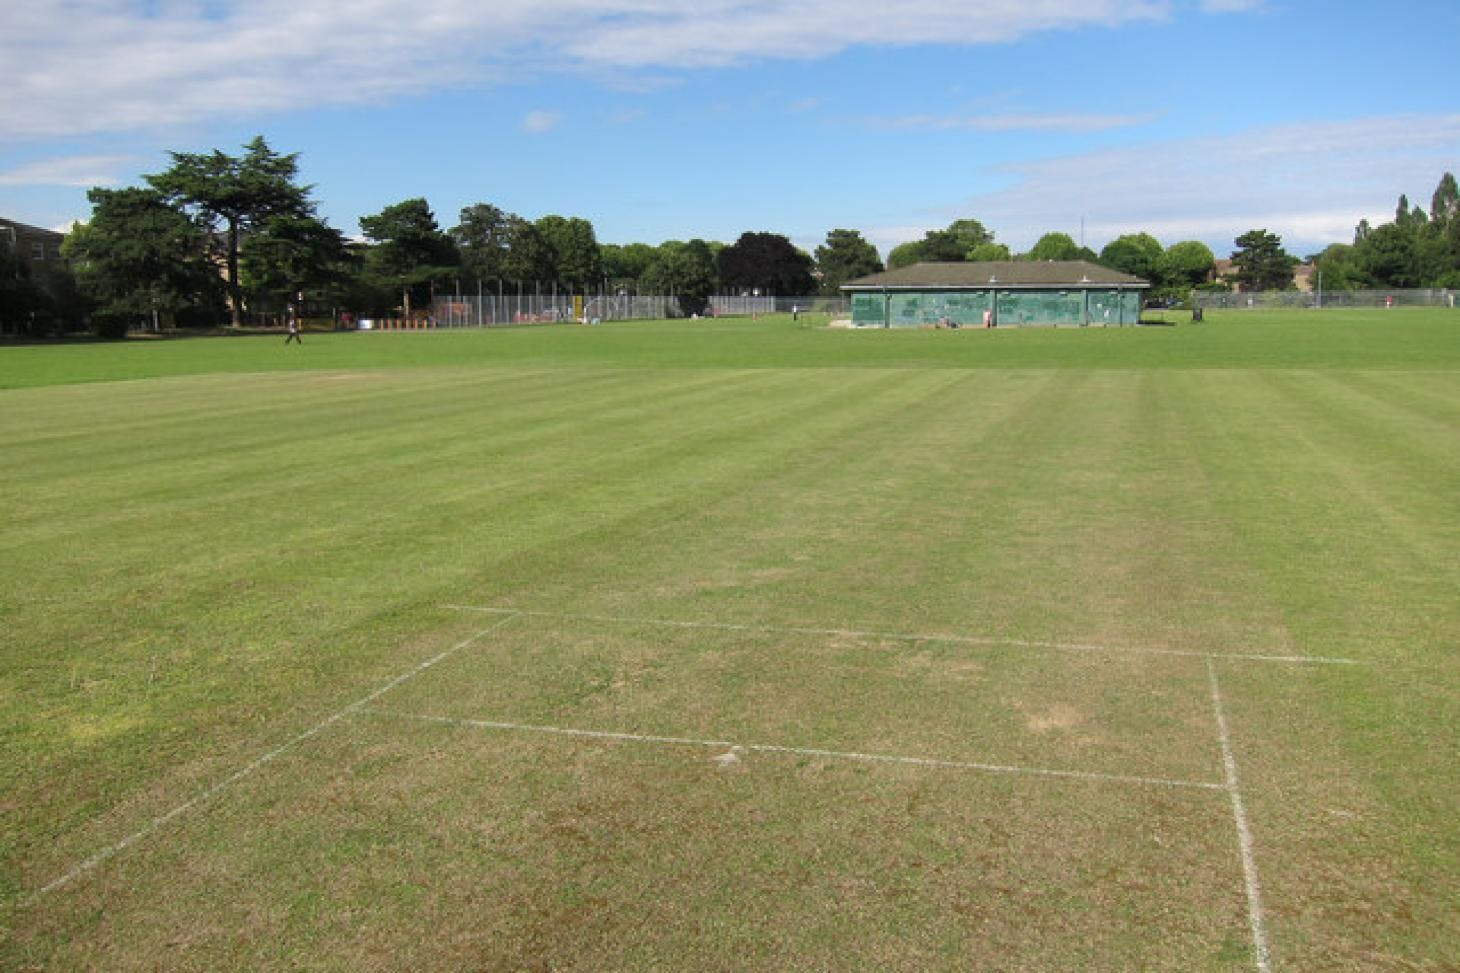 Victoria Recreation Ground Full size | Grass cricket facilities